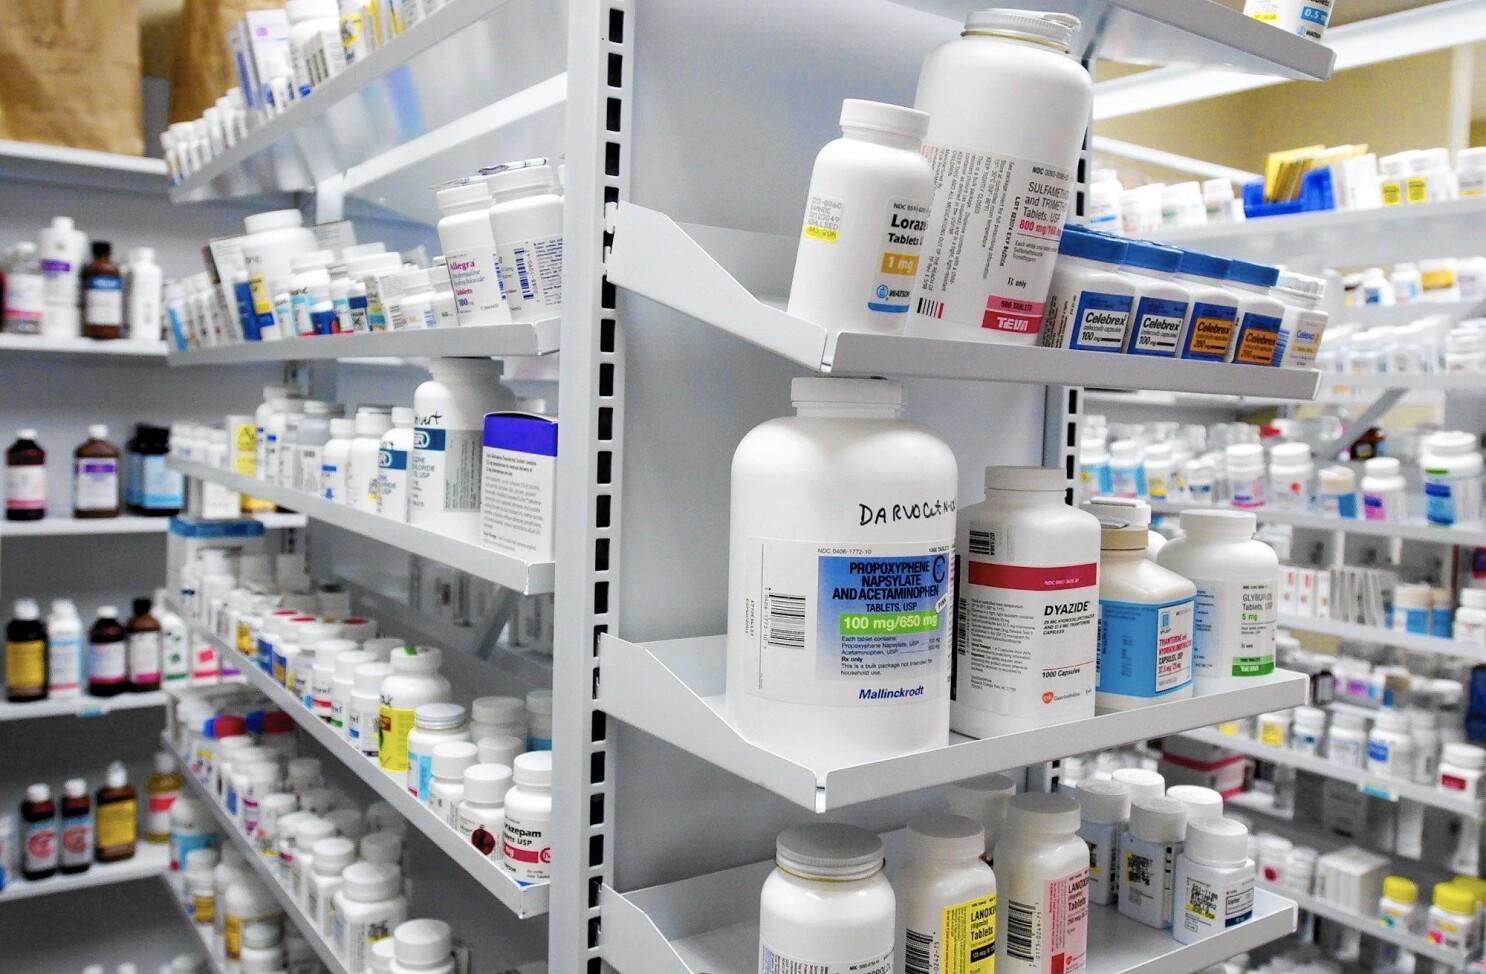 Senators unveil plan to save $100 billion on U.S. drug costs